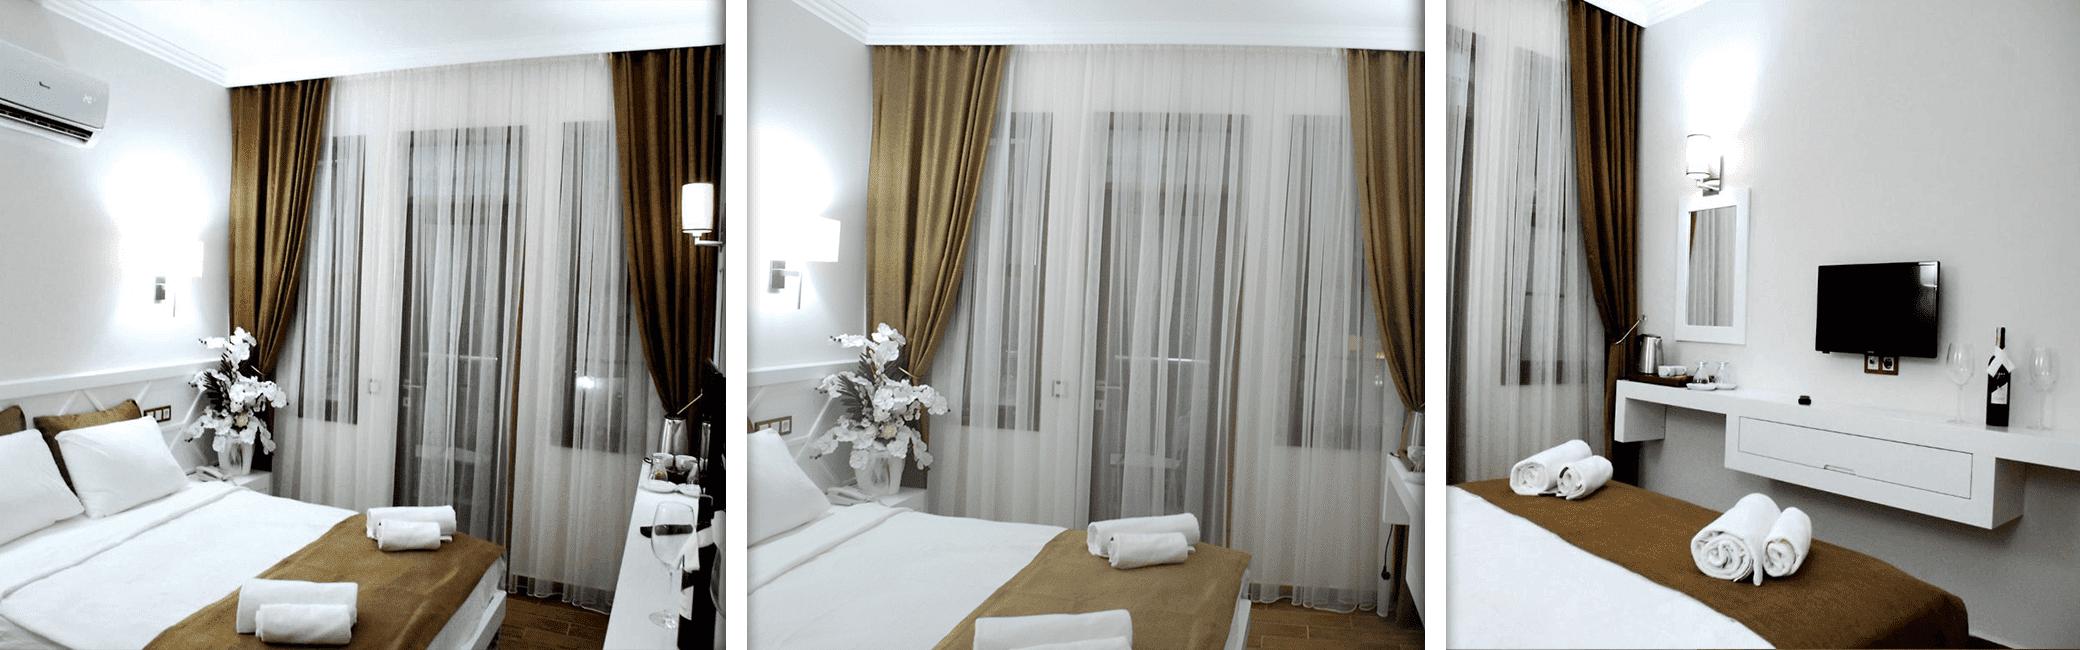 elegance hotel kemer standart oda